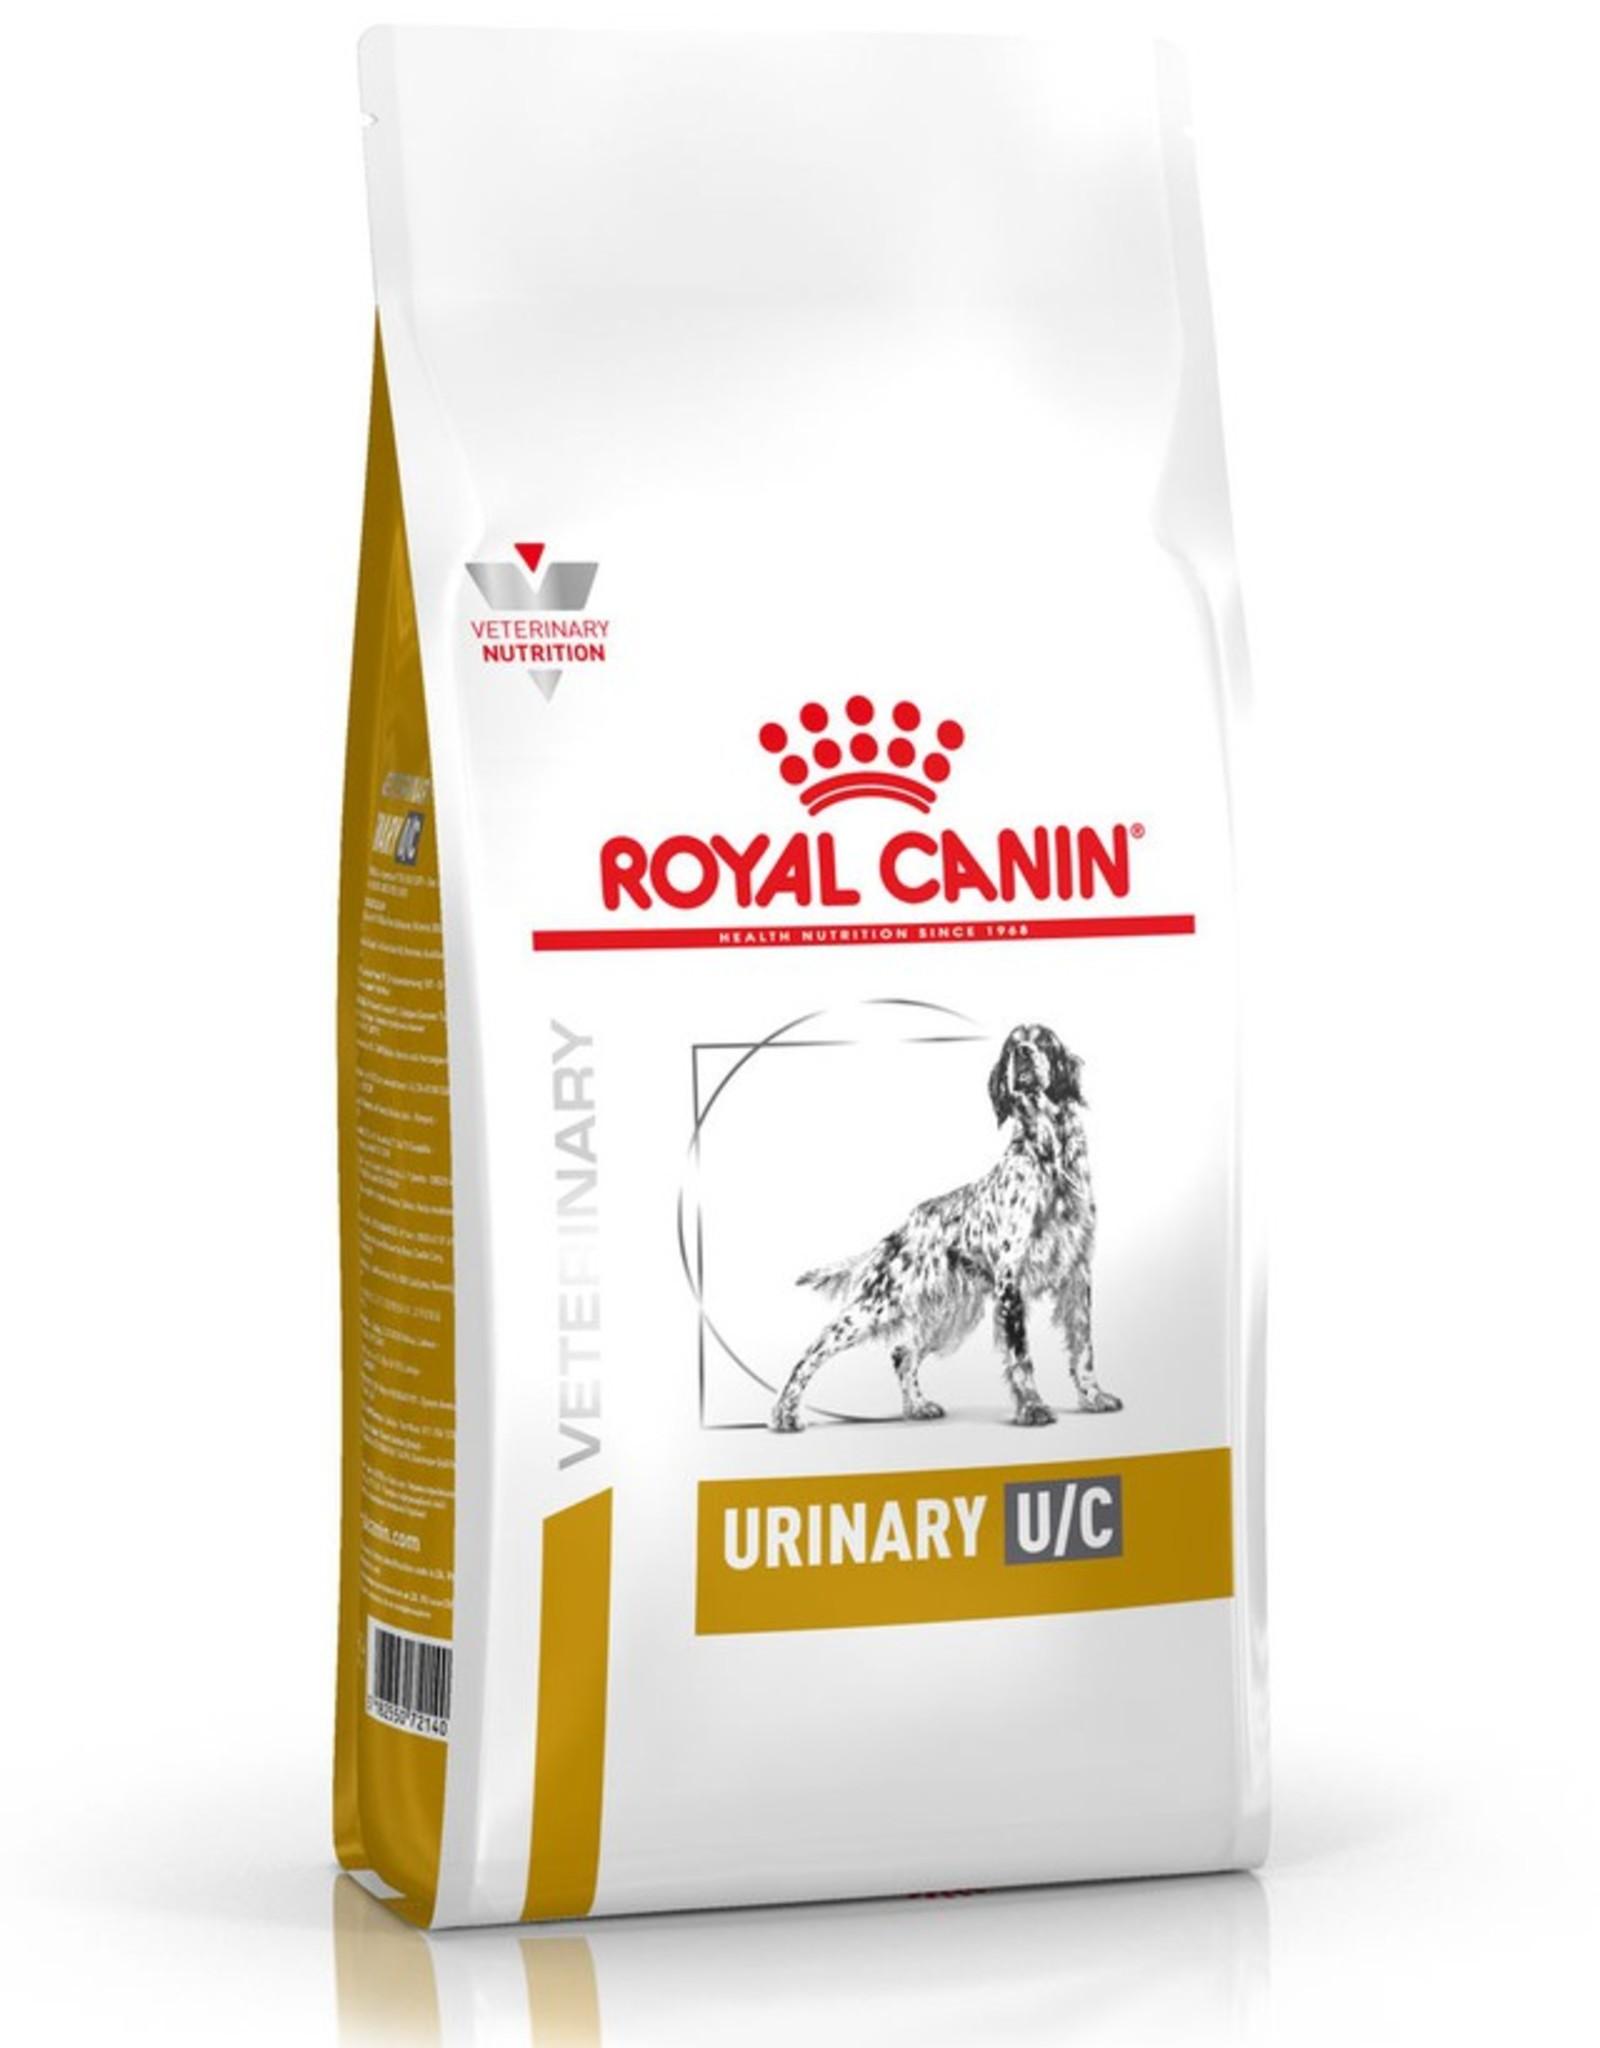 Royal Canin Royal Canin Urinary U/c Low Proteine   Dog 14kg